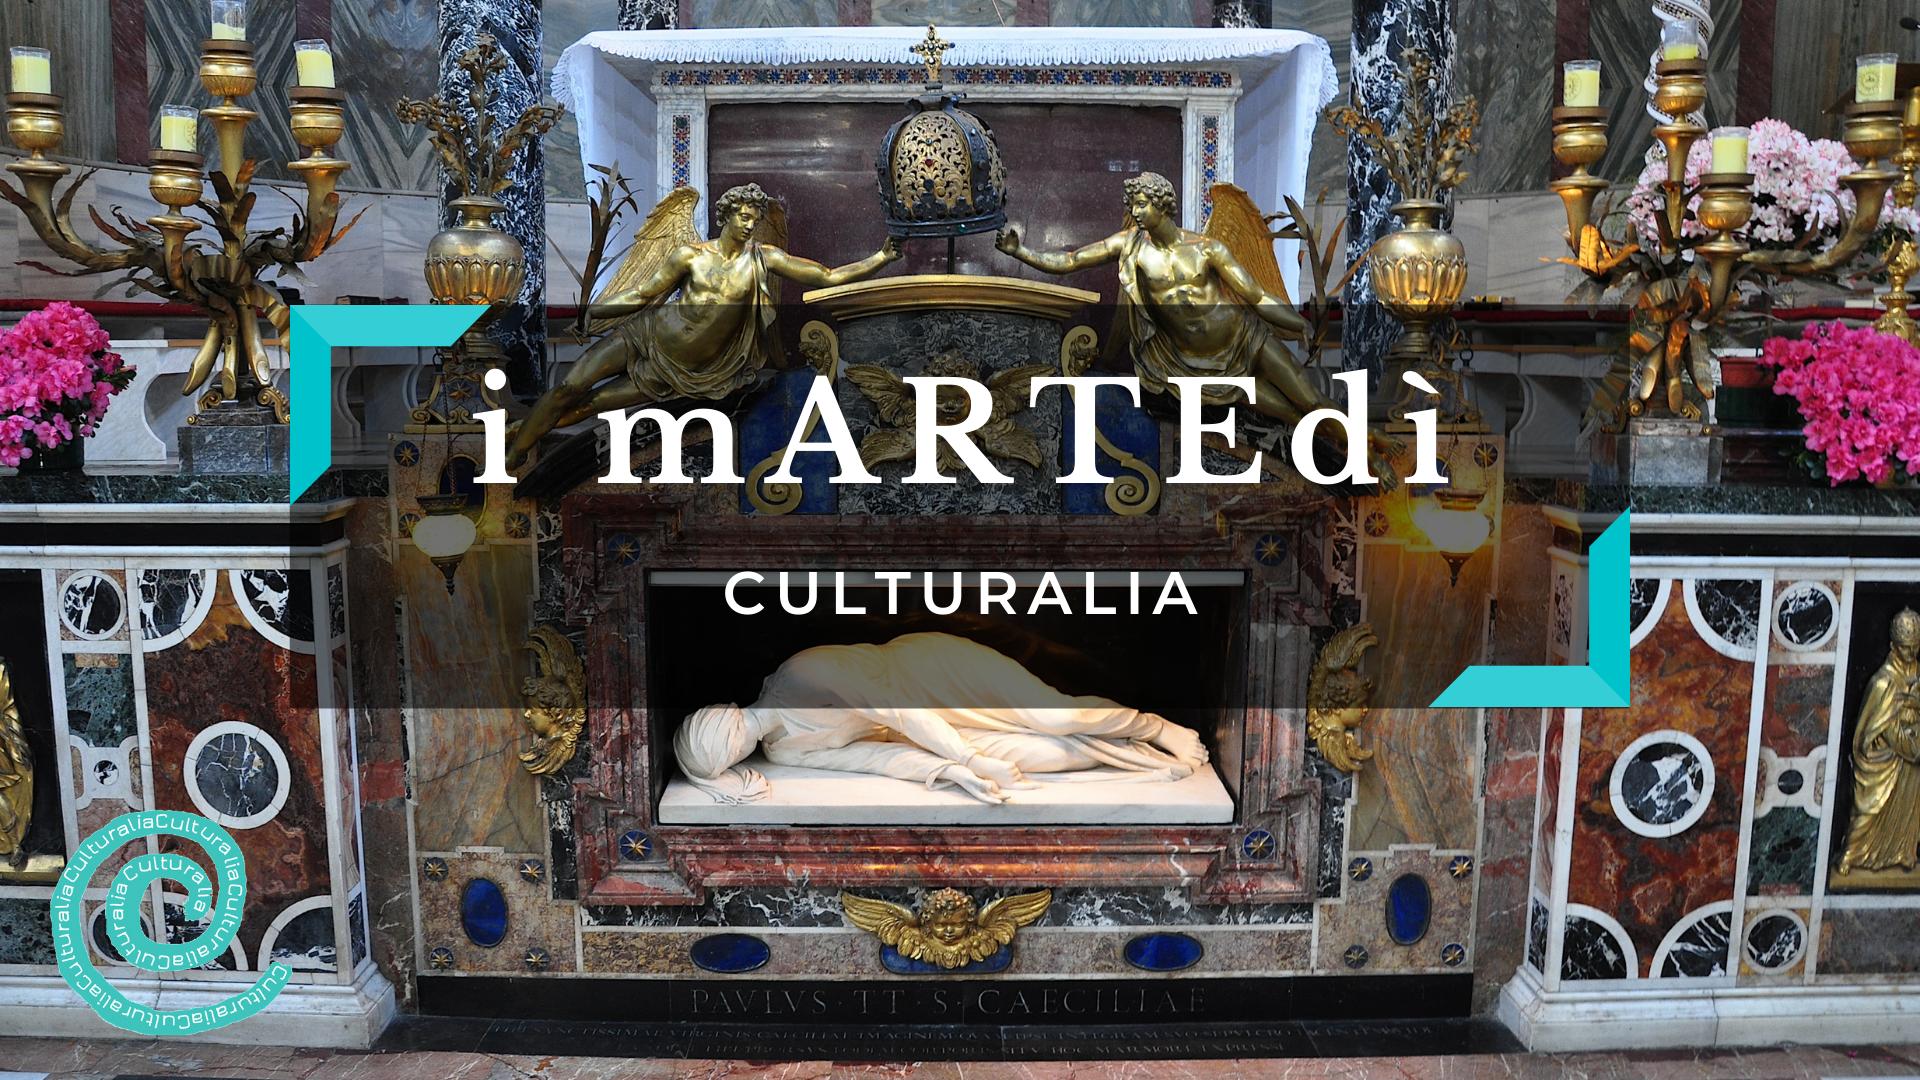 mARTEdì santa cecilia culturalia